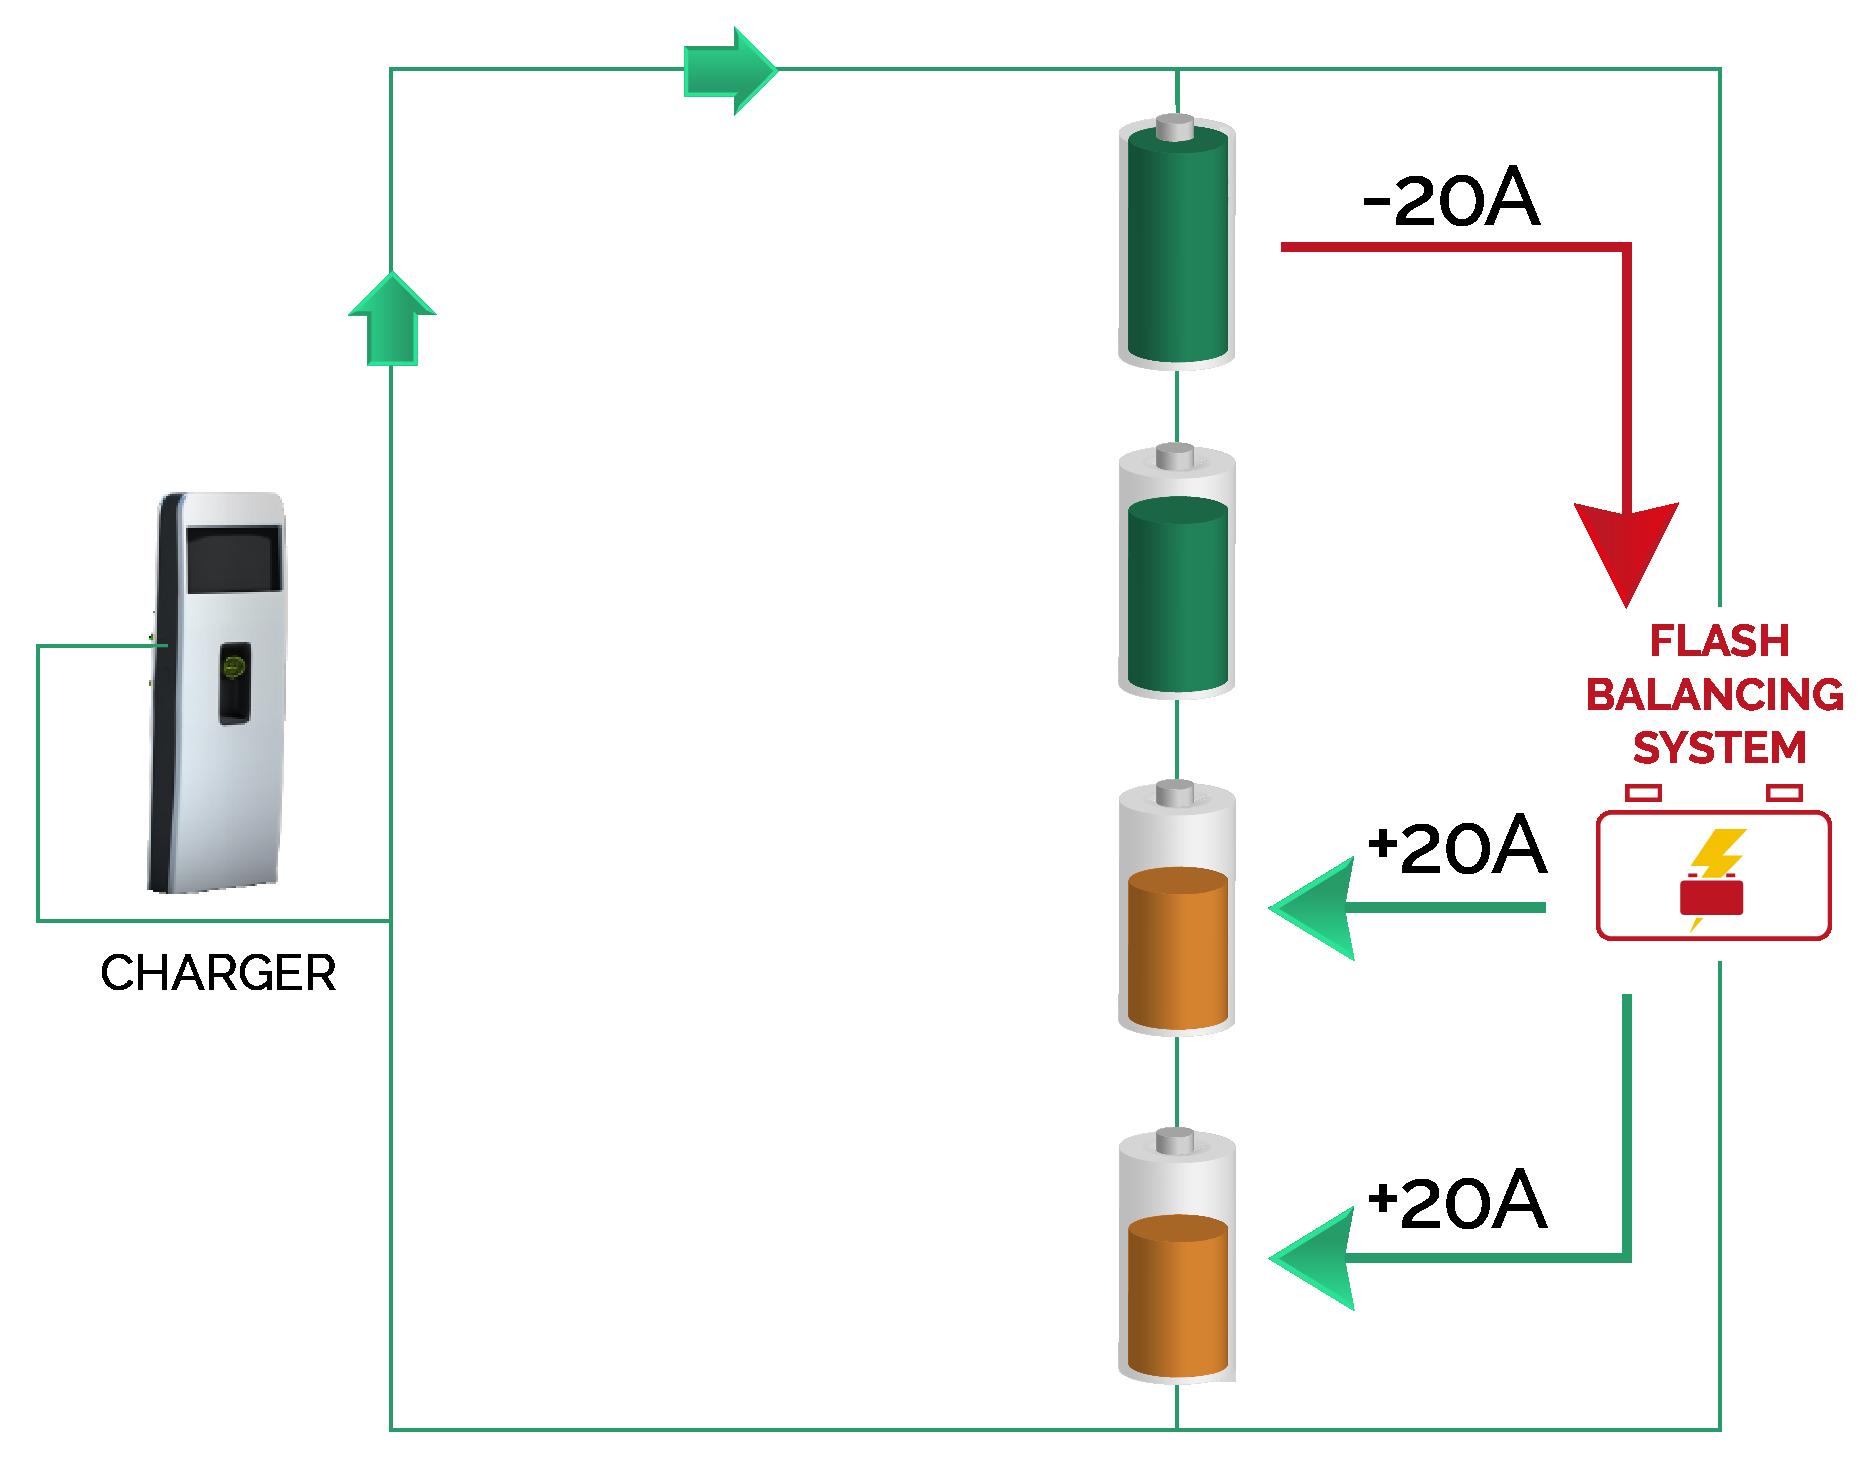 bms bilanciamento batterie flash battery